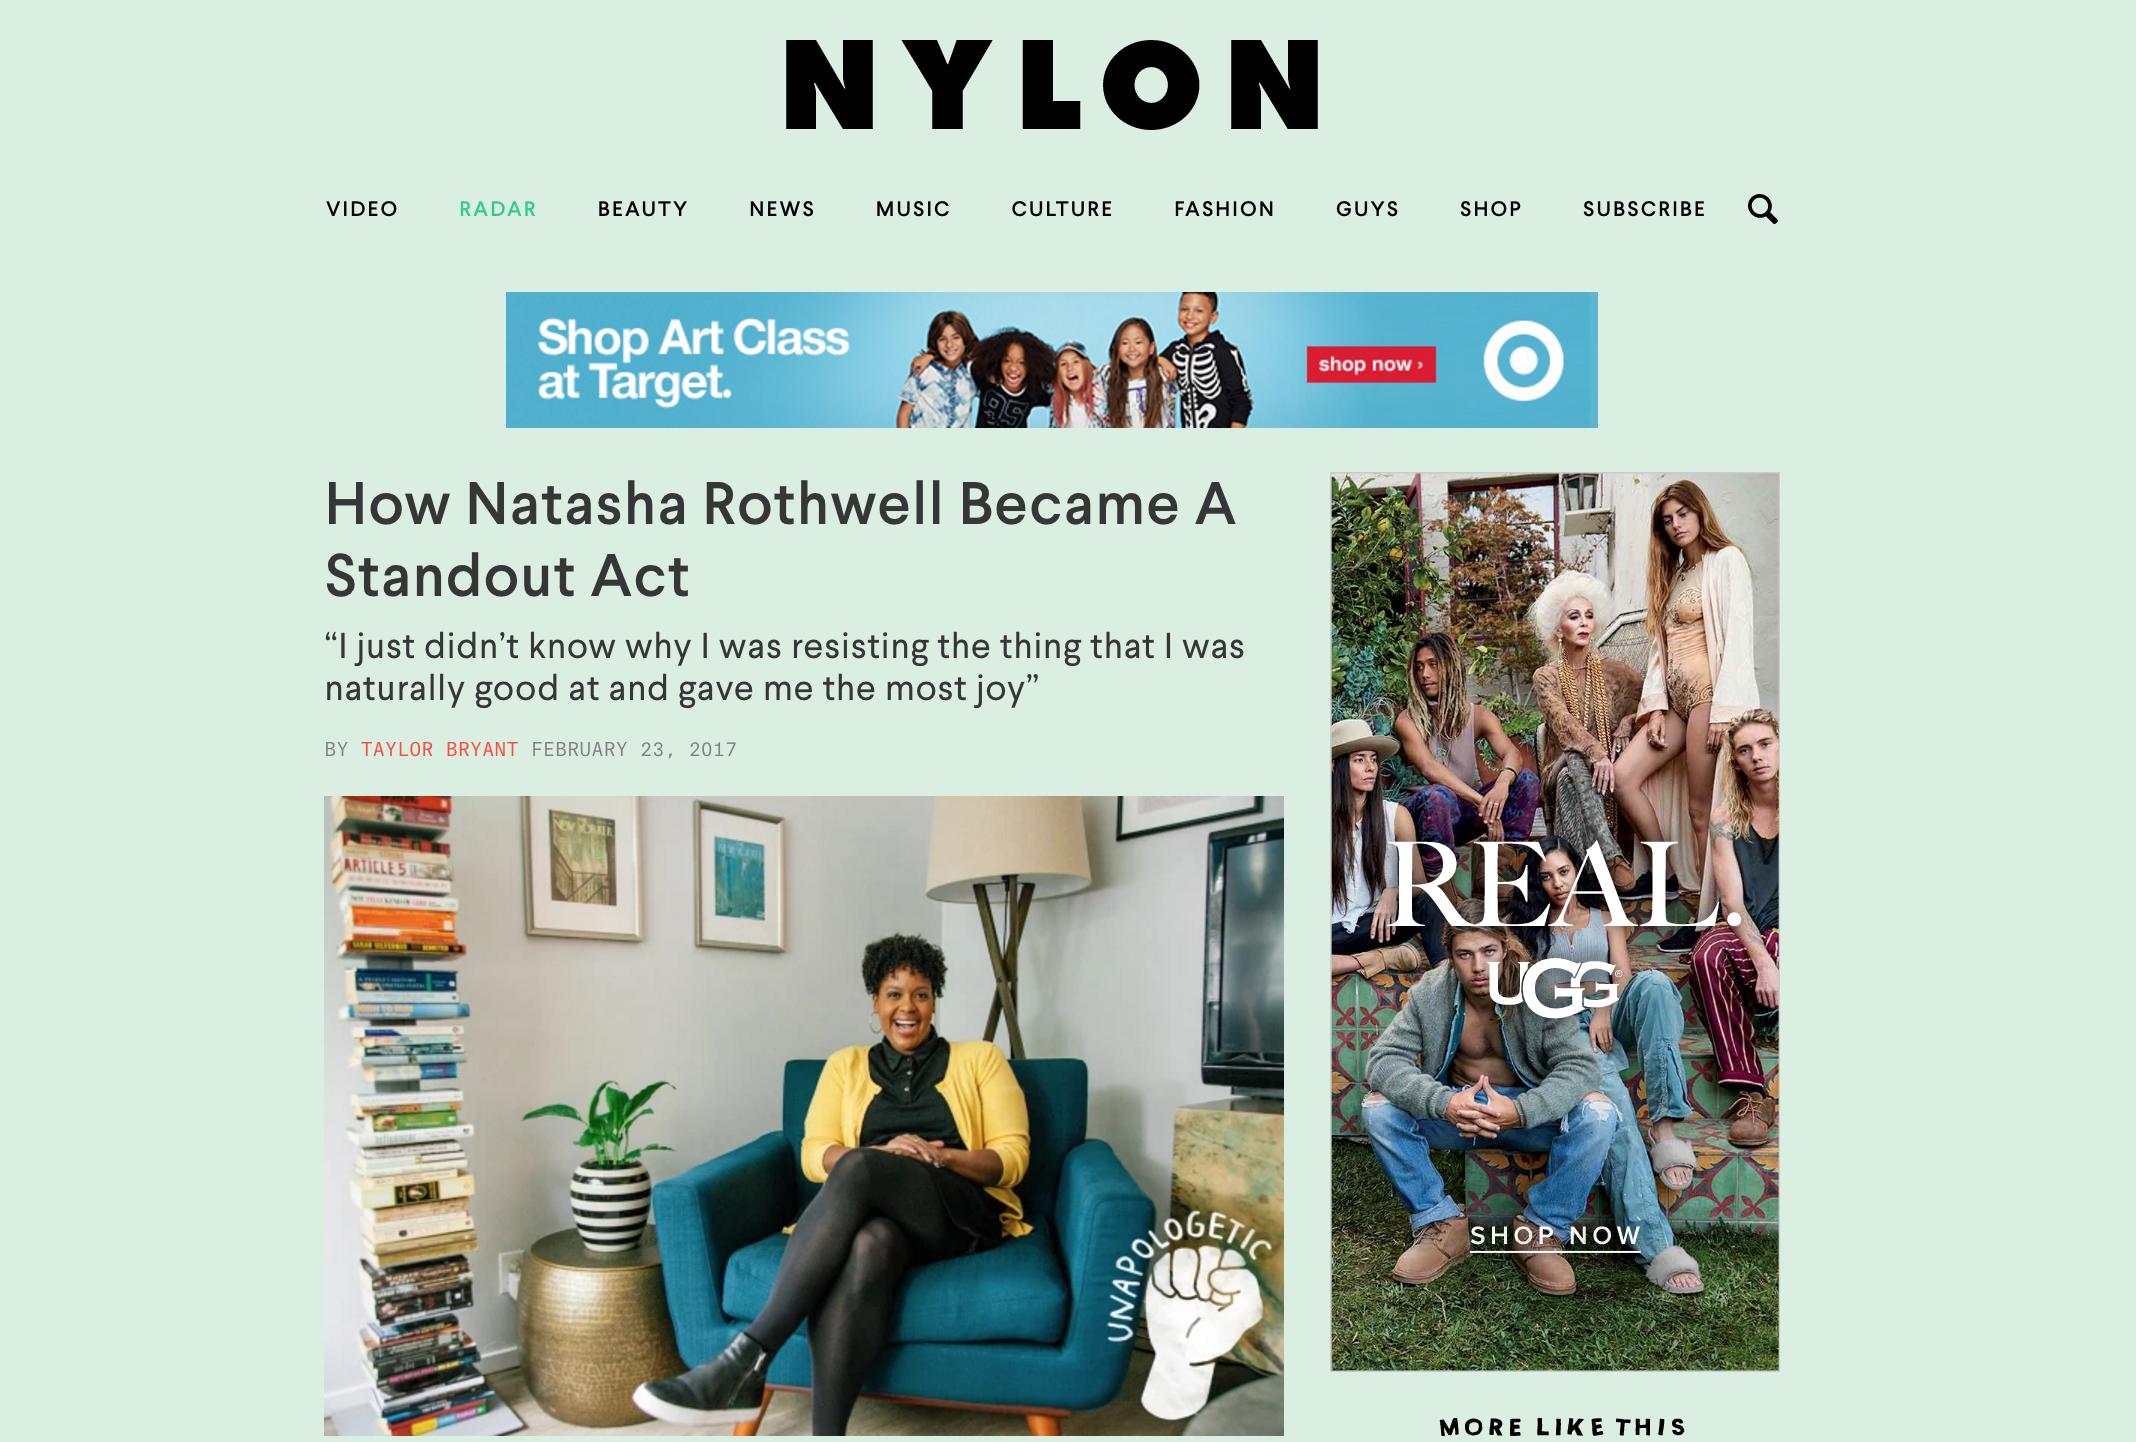 "Nylon Magazine: ""How Natasha Rothwell Became A Standout Act"" - February 2017"